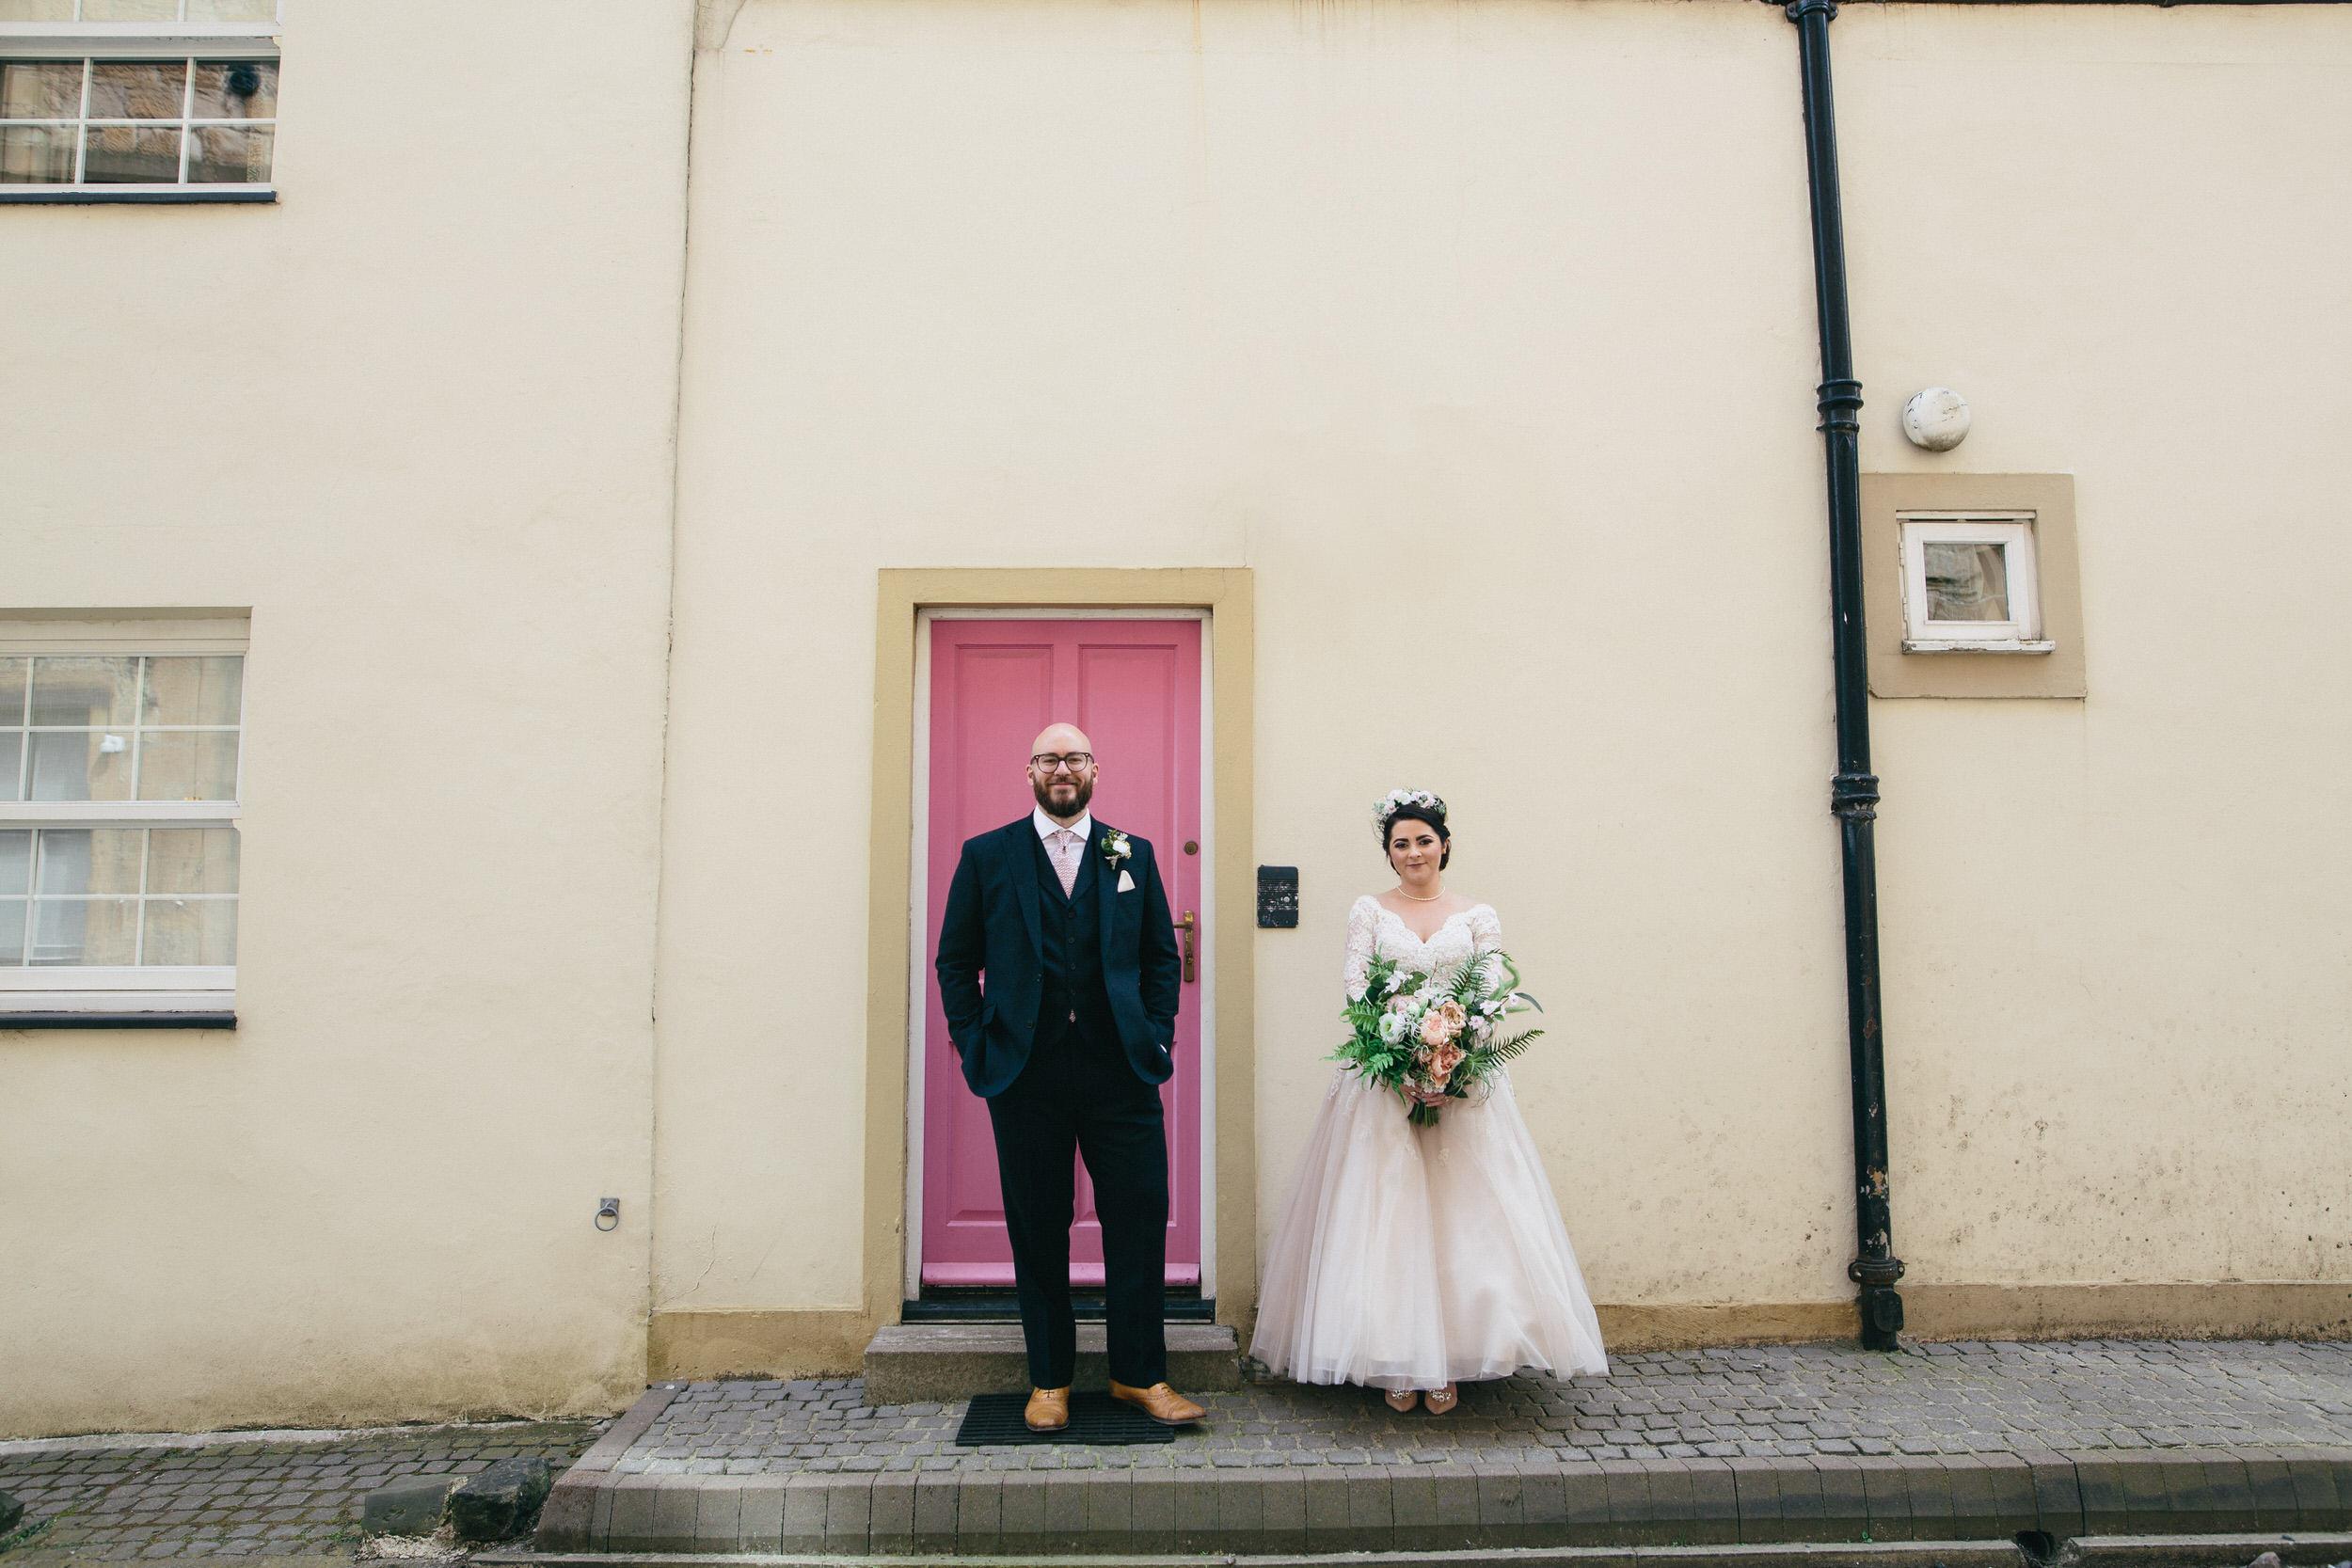 Quirky Wedding Photographer Scotland Glasgow Edinburgh Mirrorbox 004.jpg